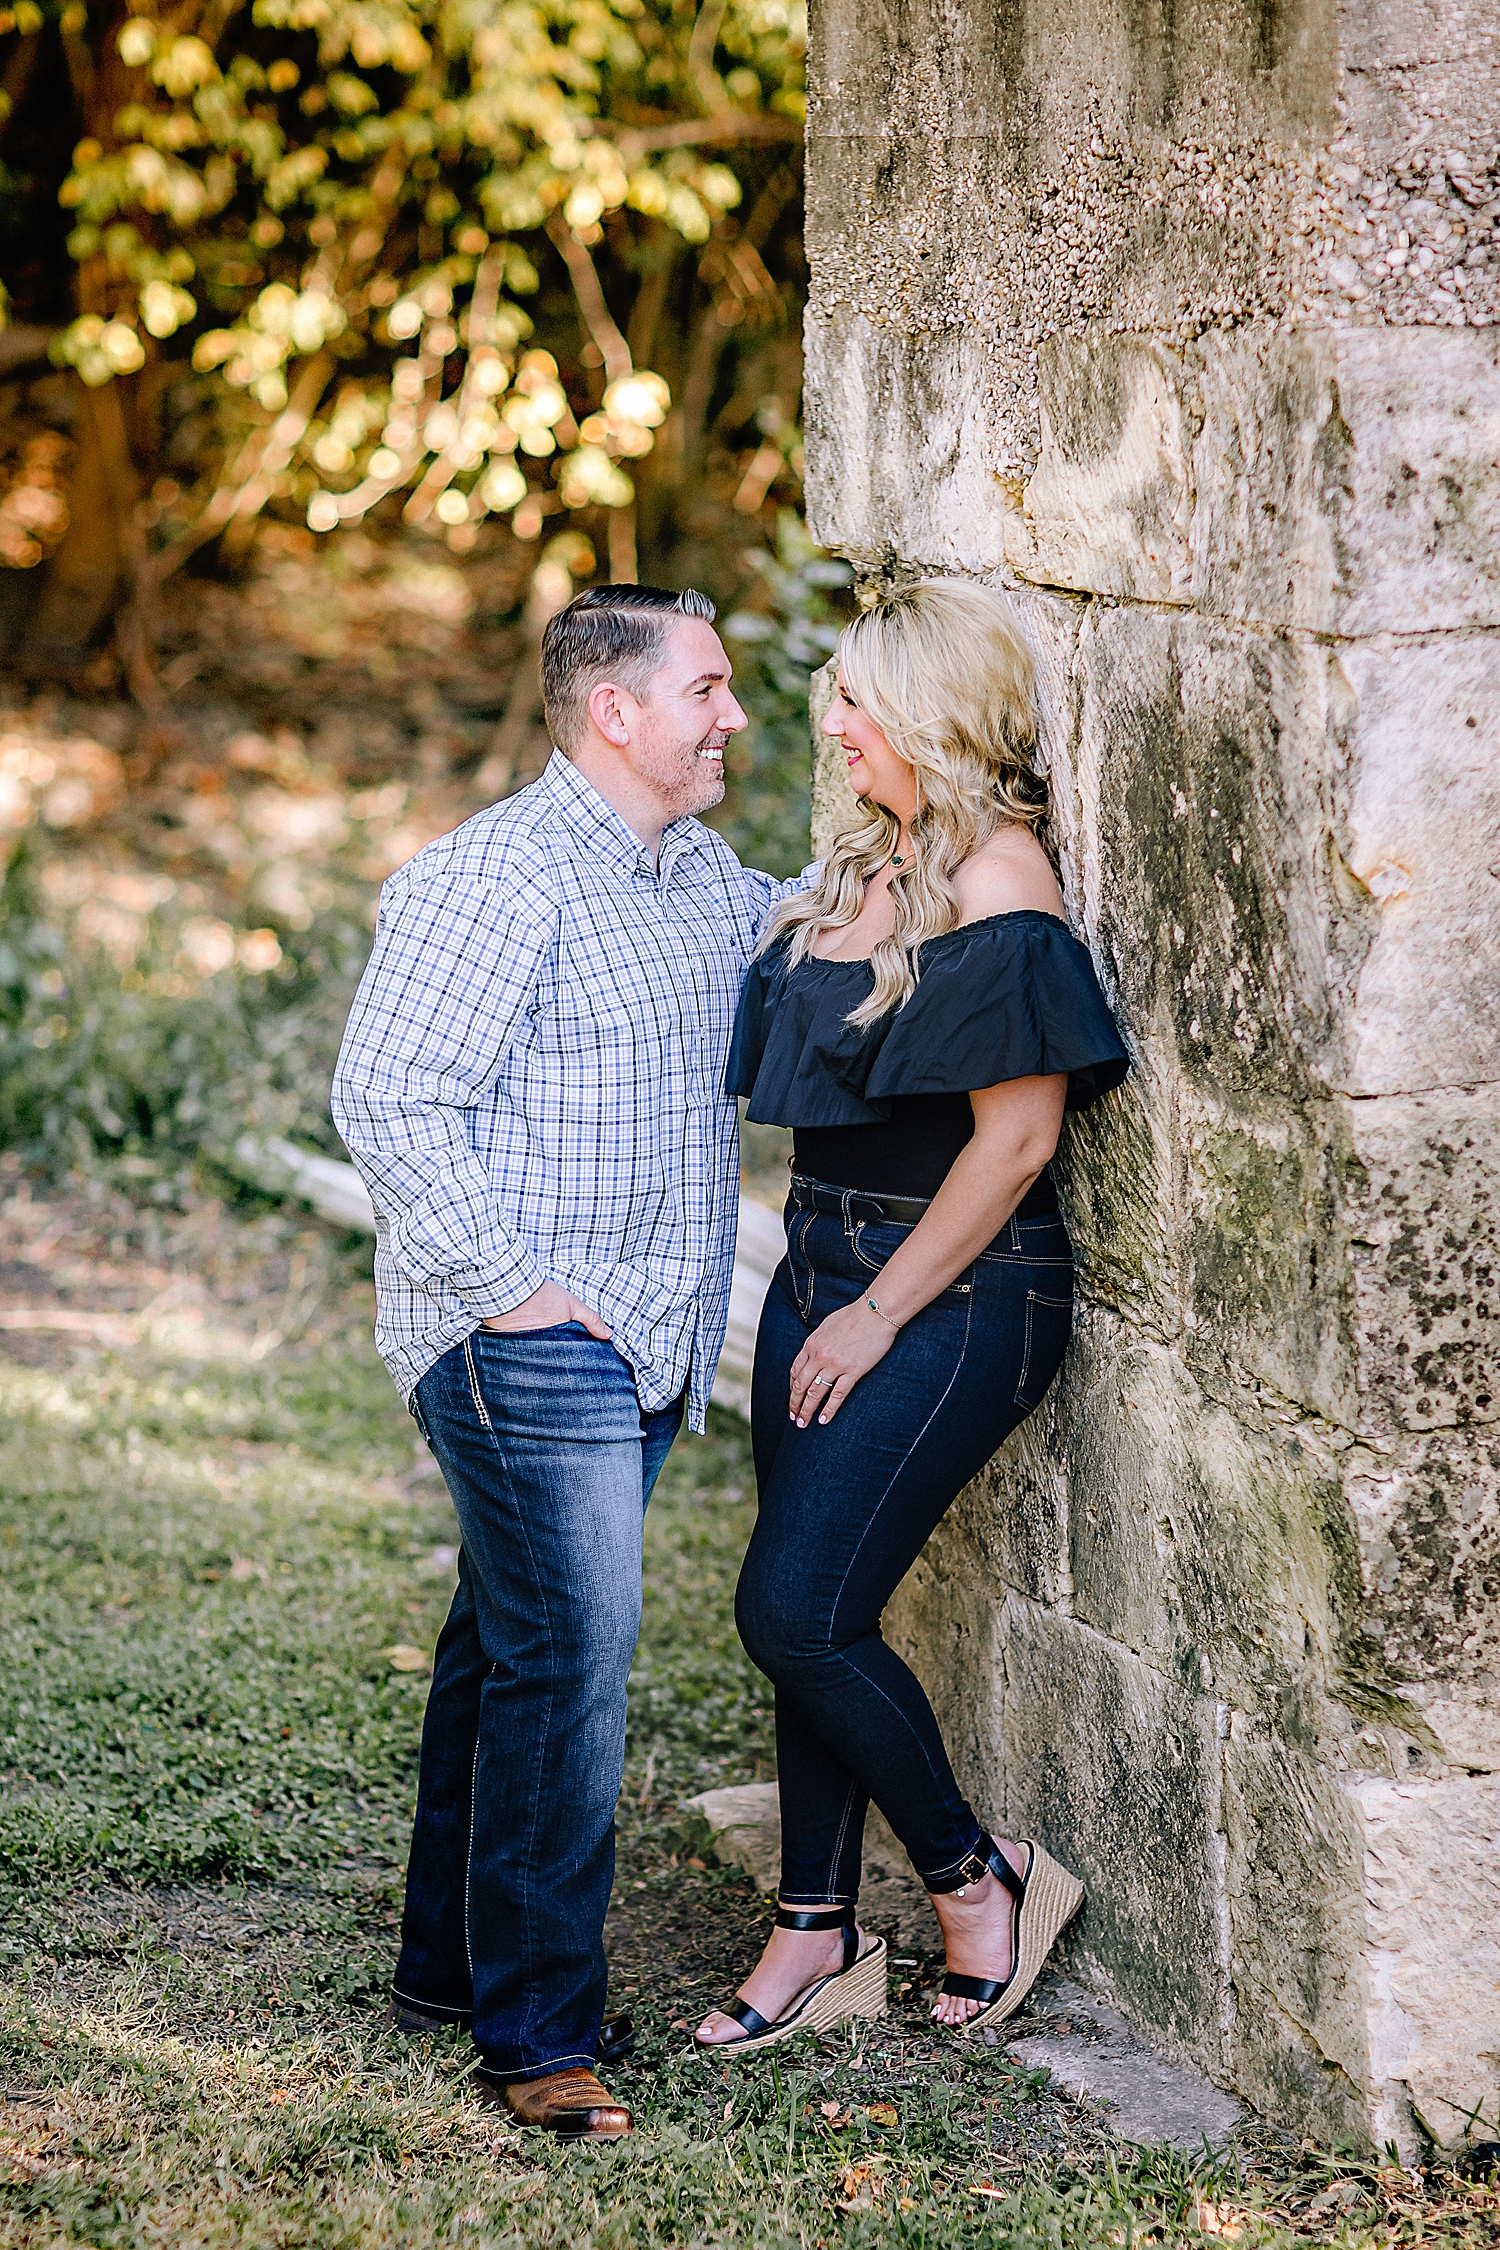 Engagement-Photo-Session-University-of-Incarnate-Word-UIW-San-Antonio-Texas-Carly-Barton-Photography_0029.jpg